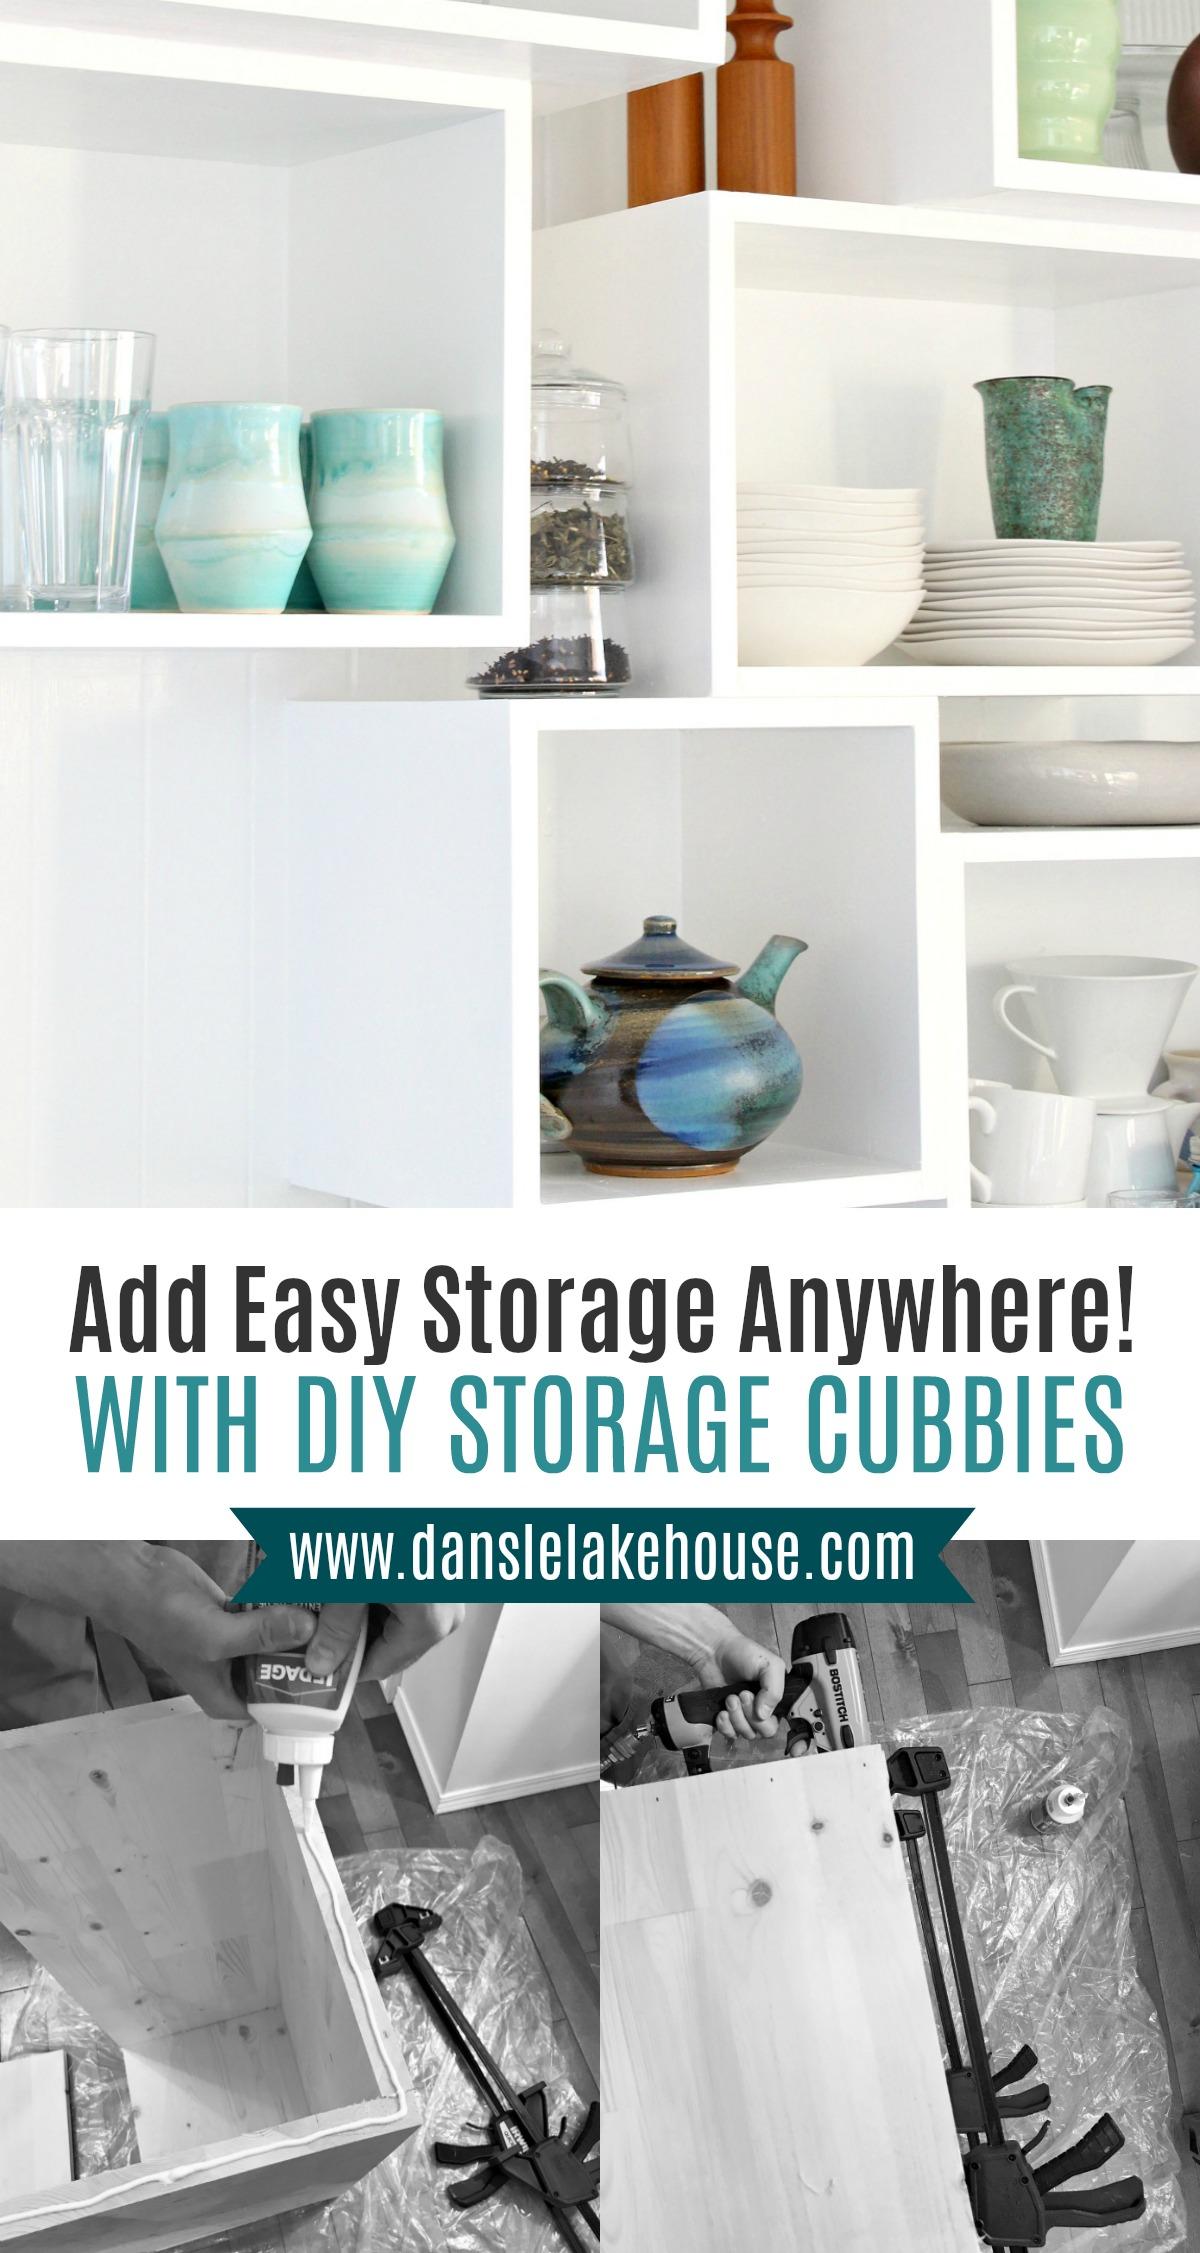 DIY storage cubbies